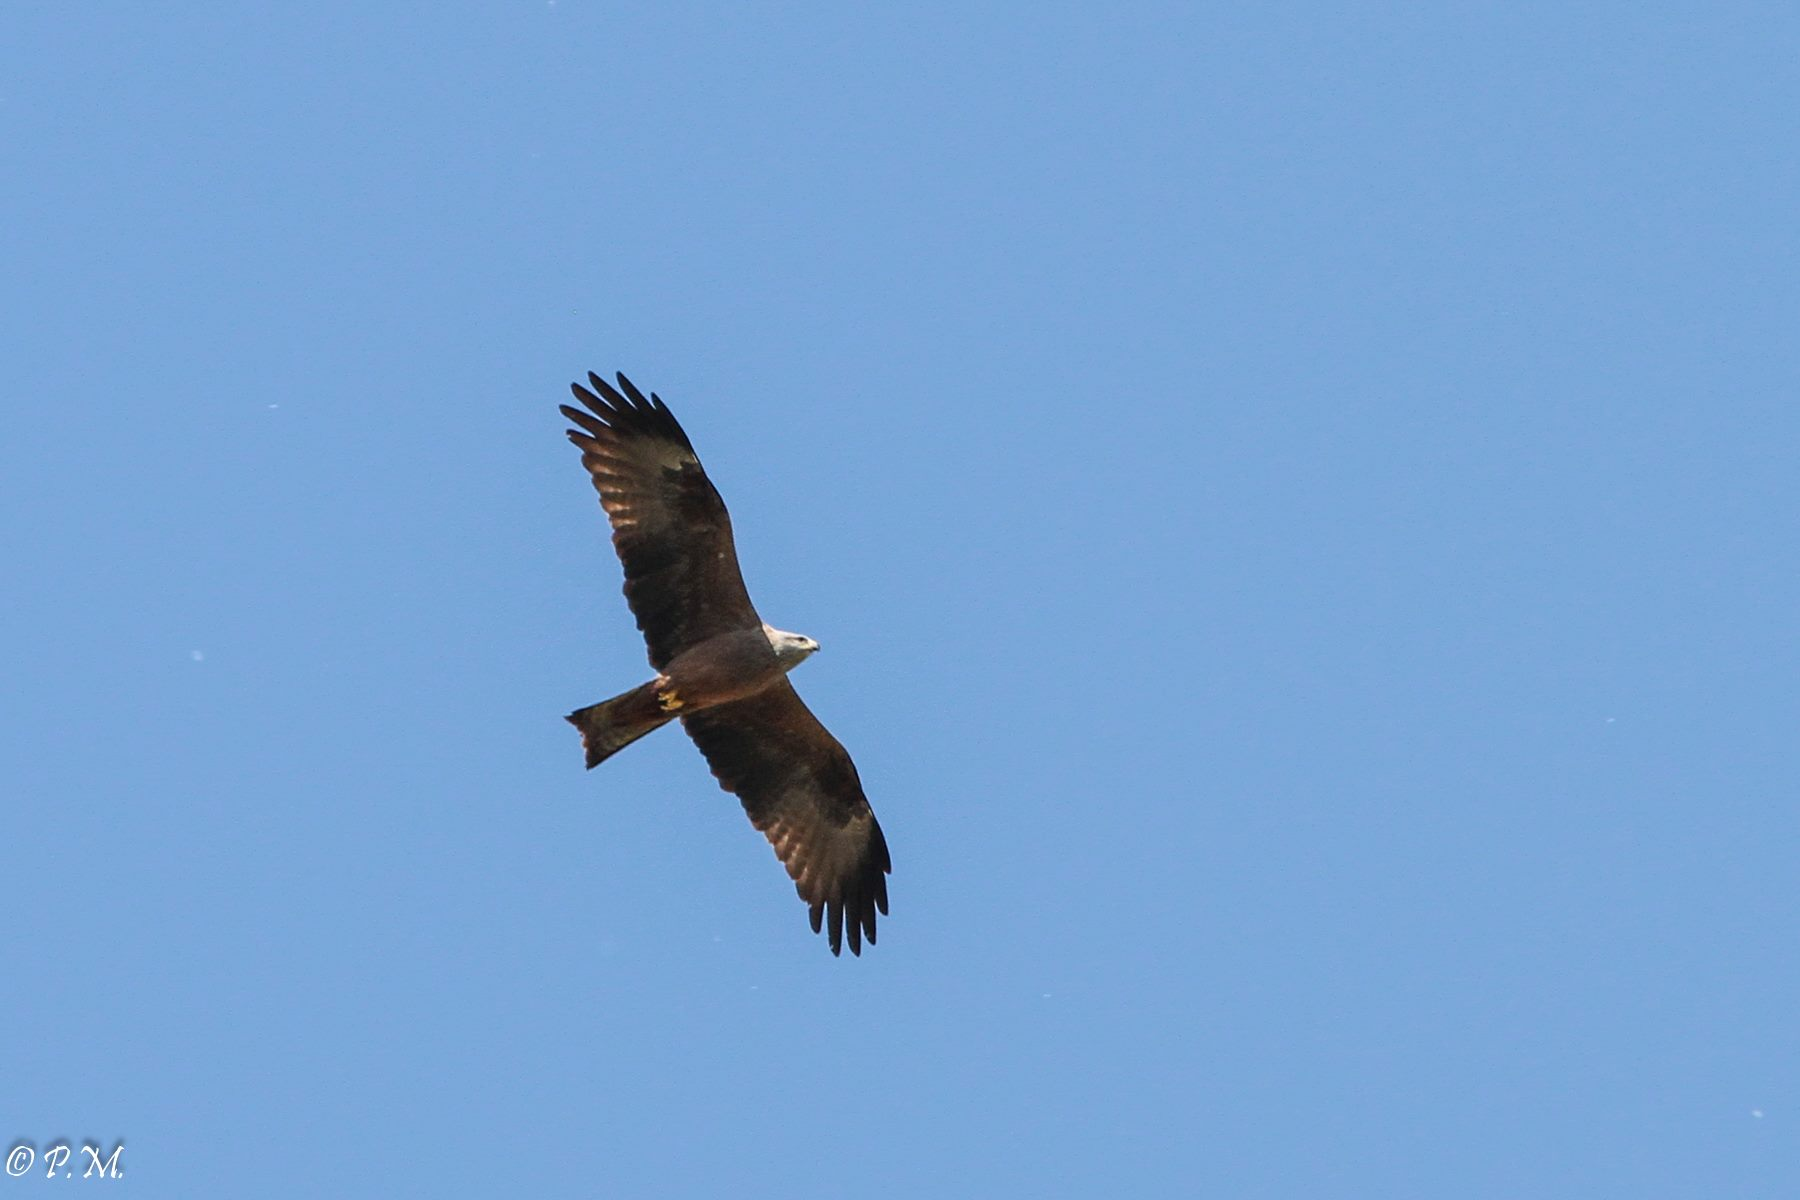 https://cdnfiles1.biolovision.net/www.faune-ain.org/userfiles/GroupeHerpeto/Photossortie/1796606813074870860067258180668229675100041o.jpg